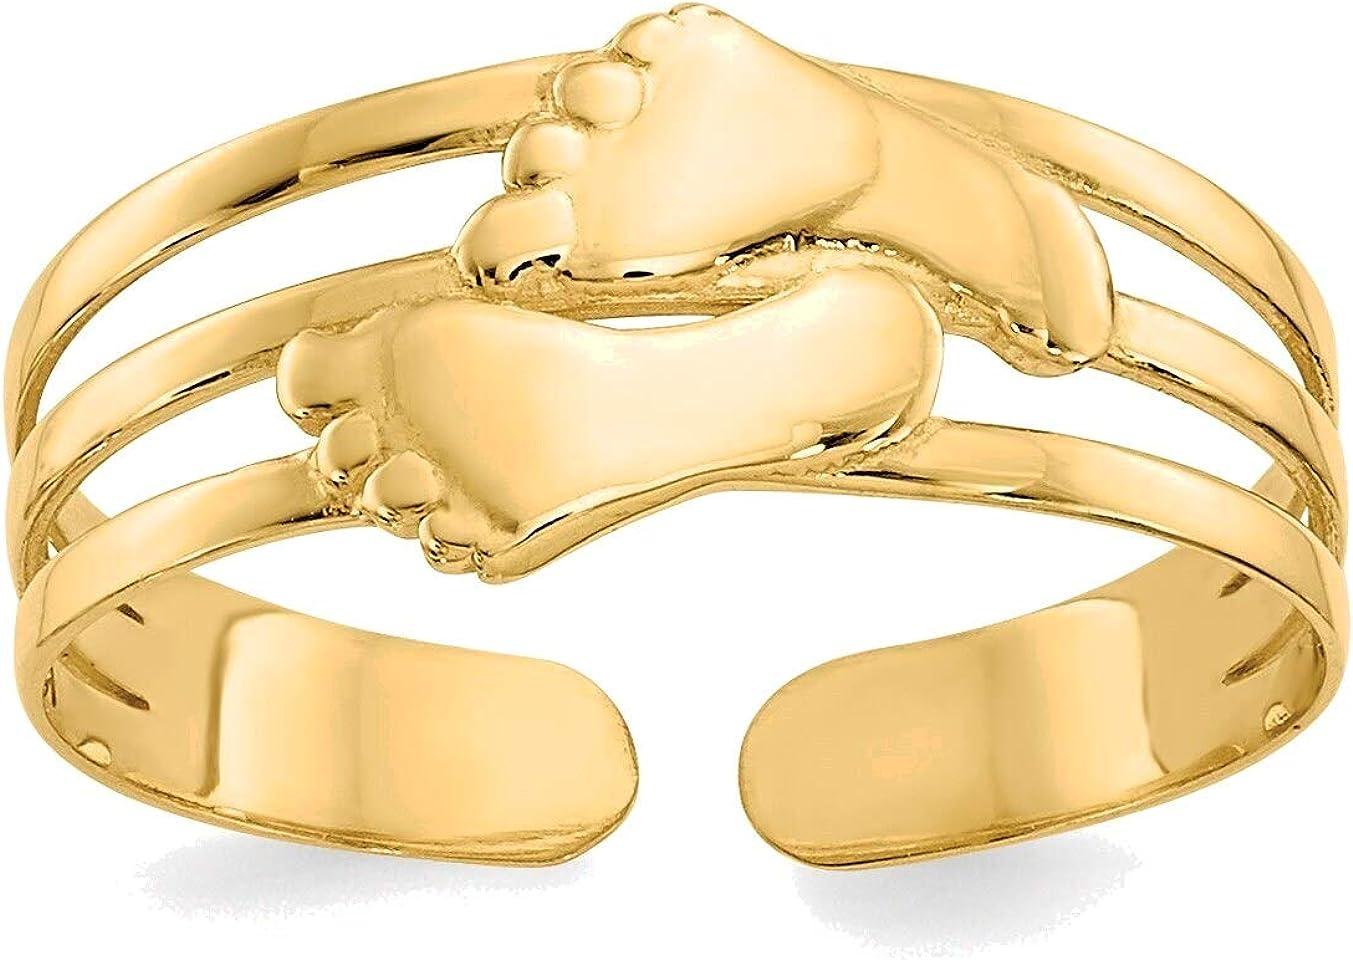 Bonyak Jewelry Bare Feet Toe Ring in 14K Yellow Gold in Size 11